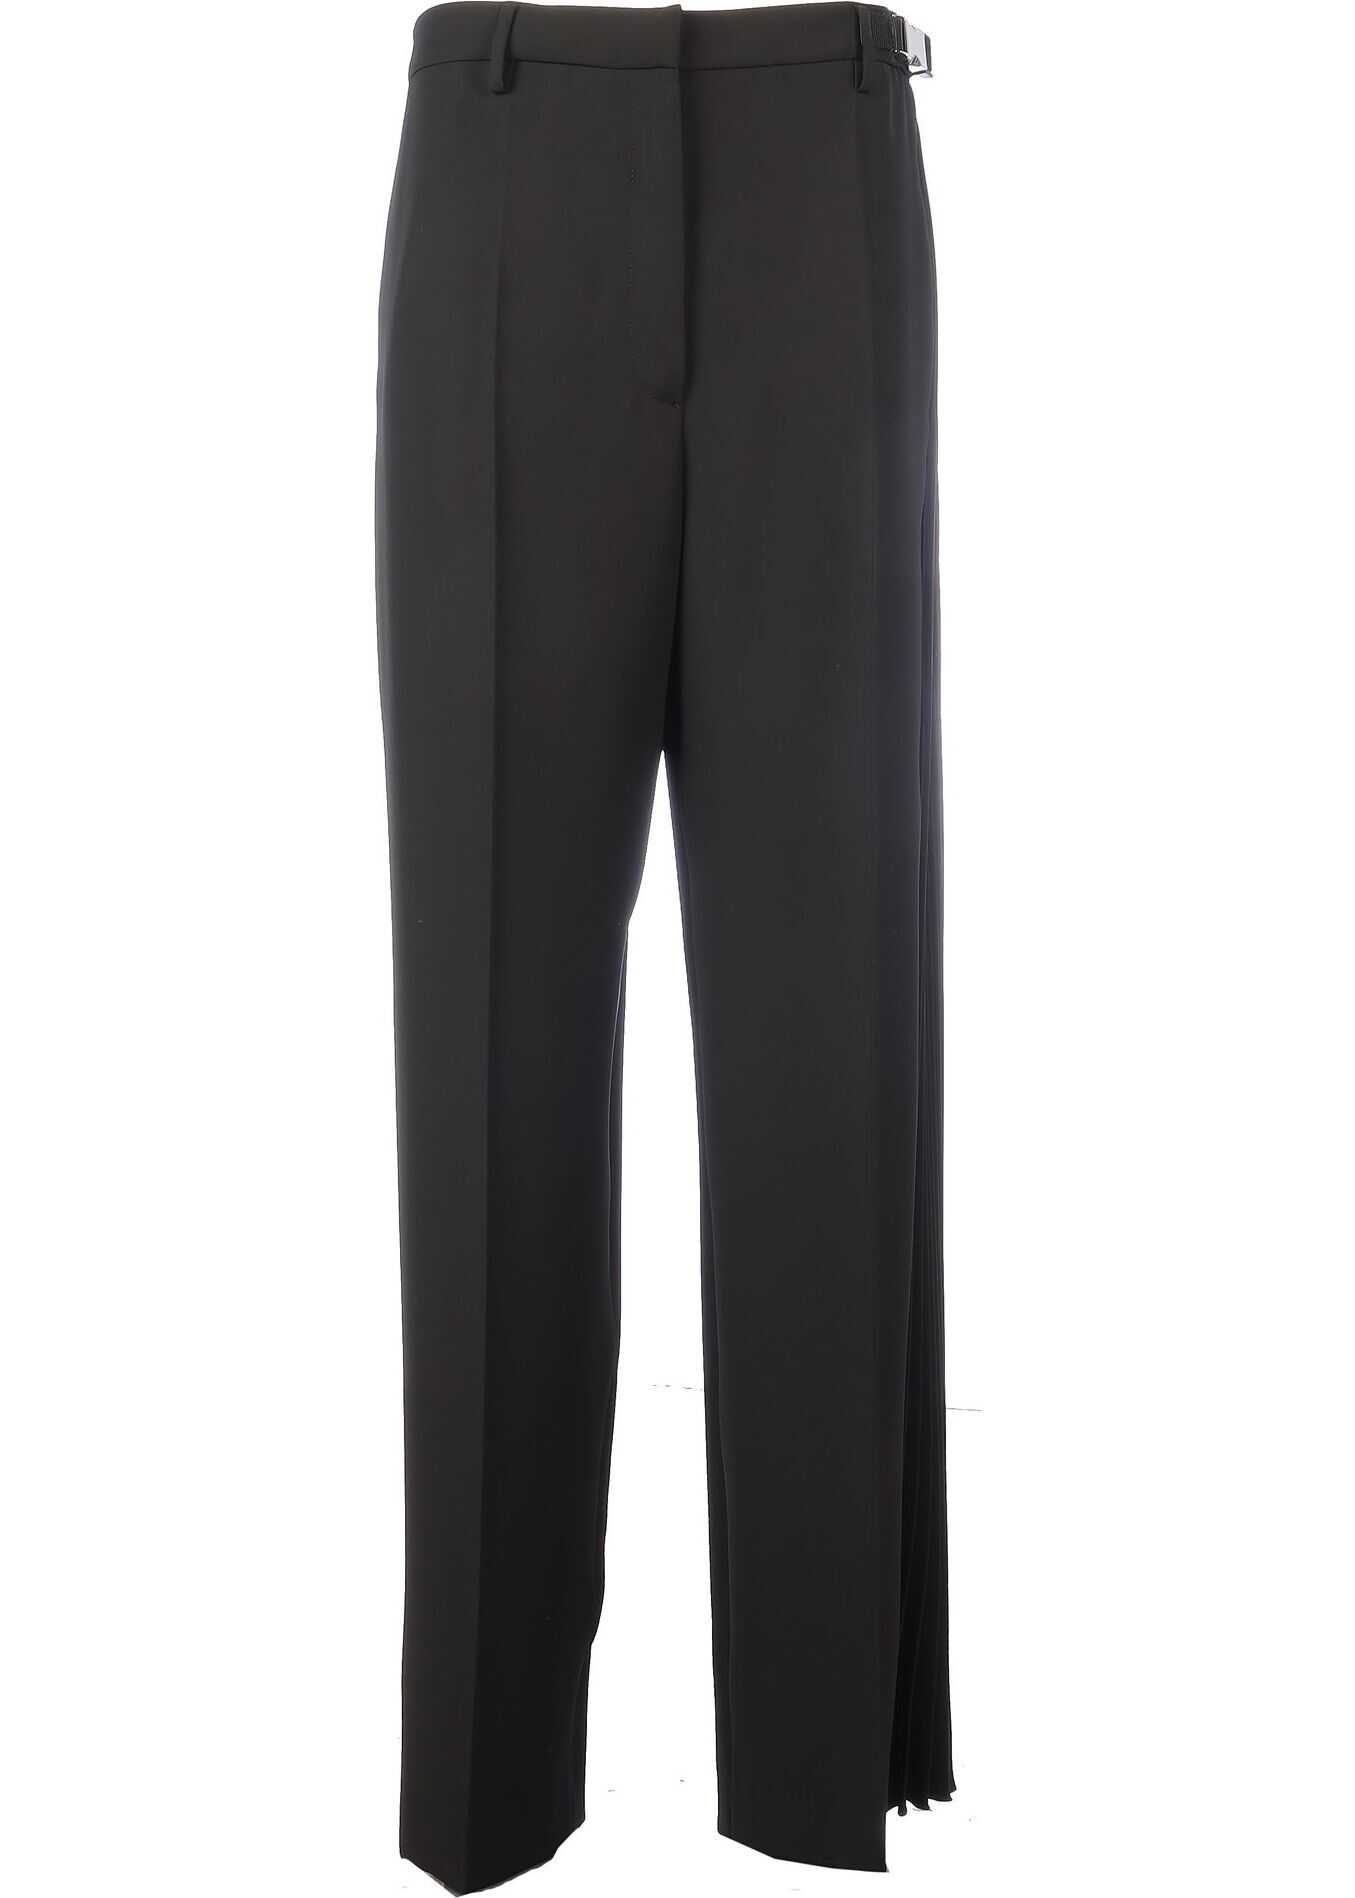 Polyester Pants